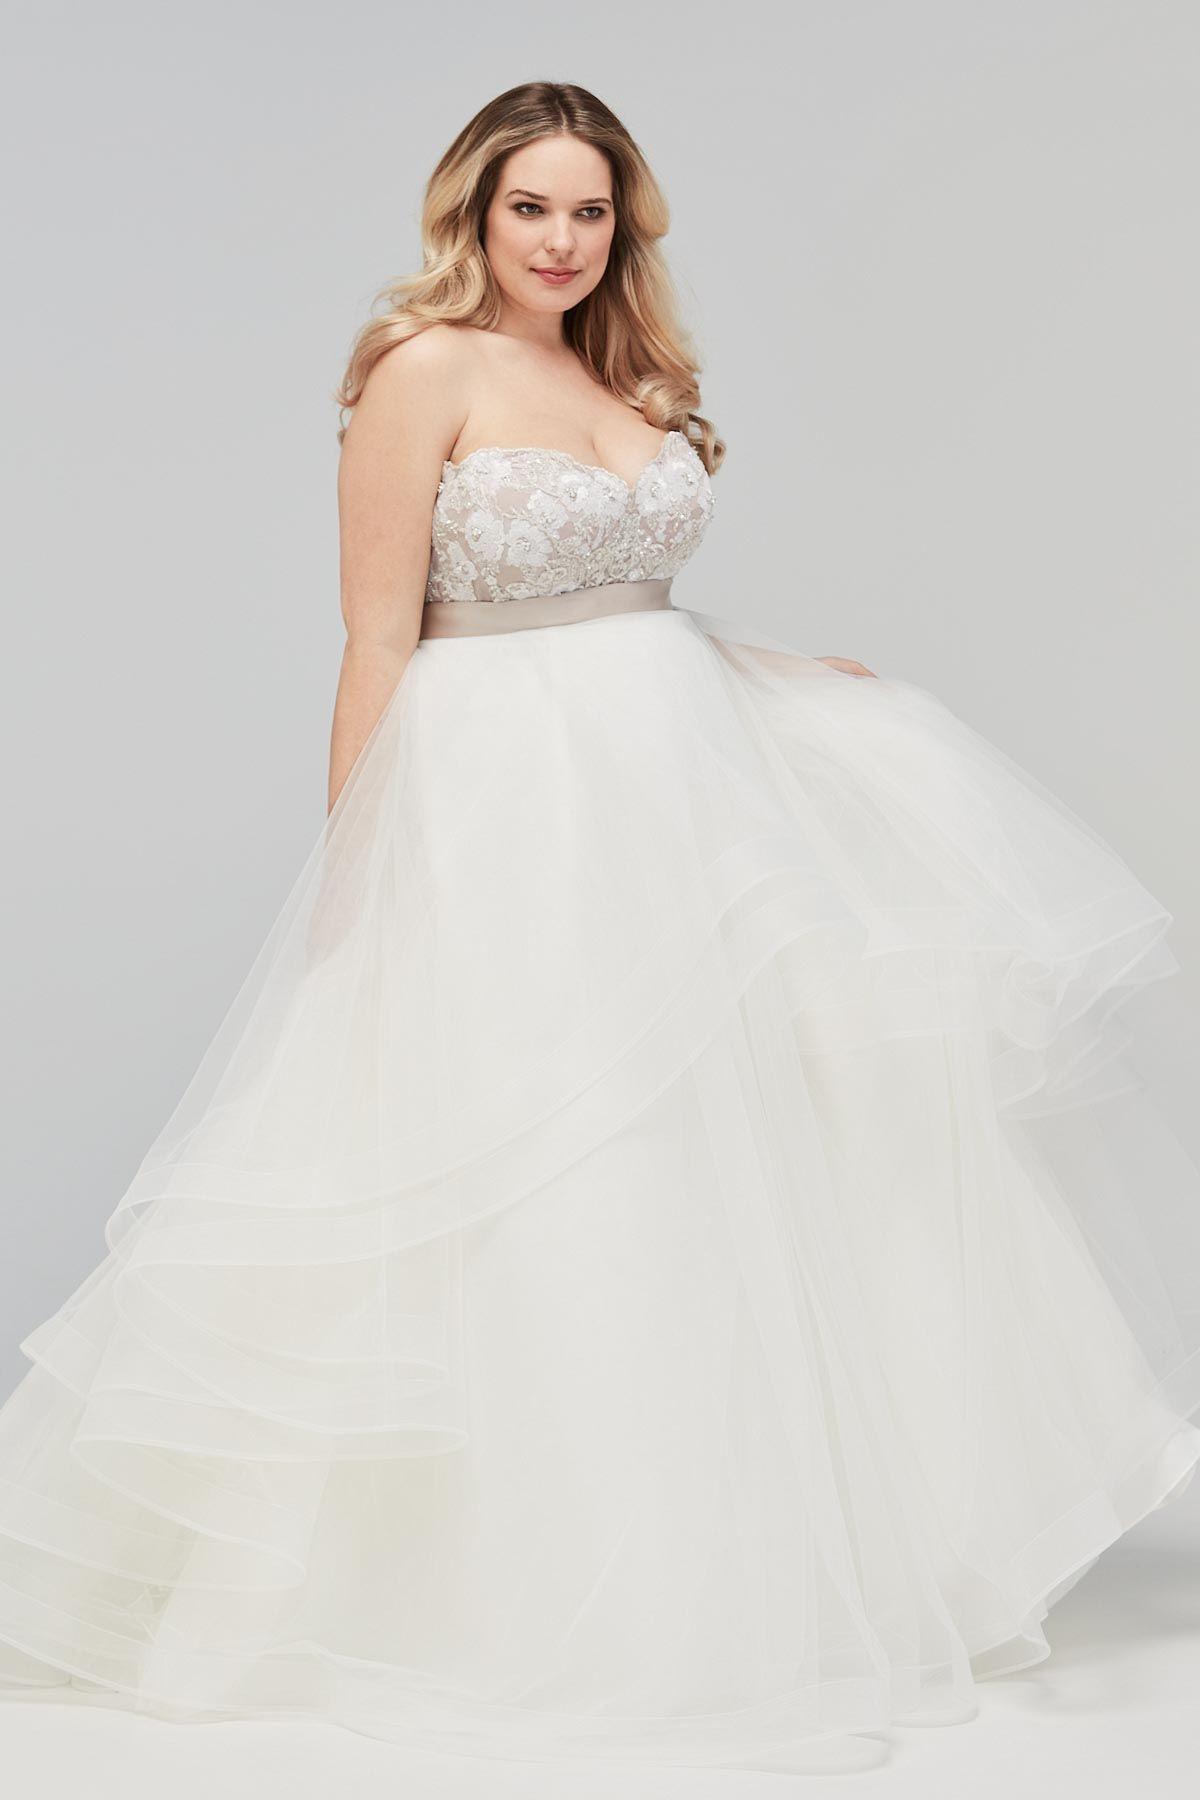 Maelin Corset 14724 | Brides | Wtoowatters: Prinzessin